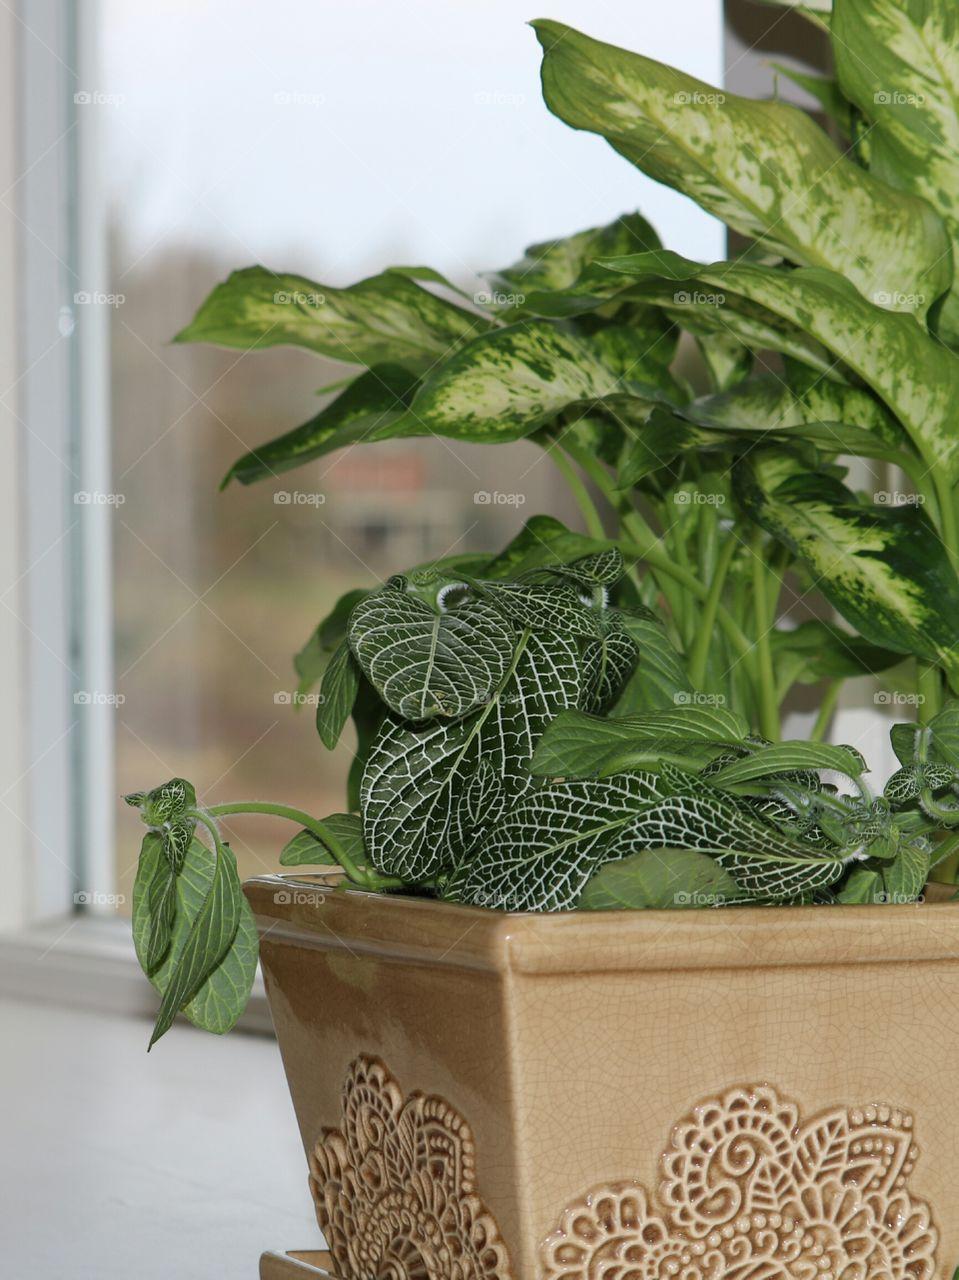 house plants in pot